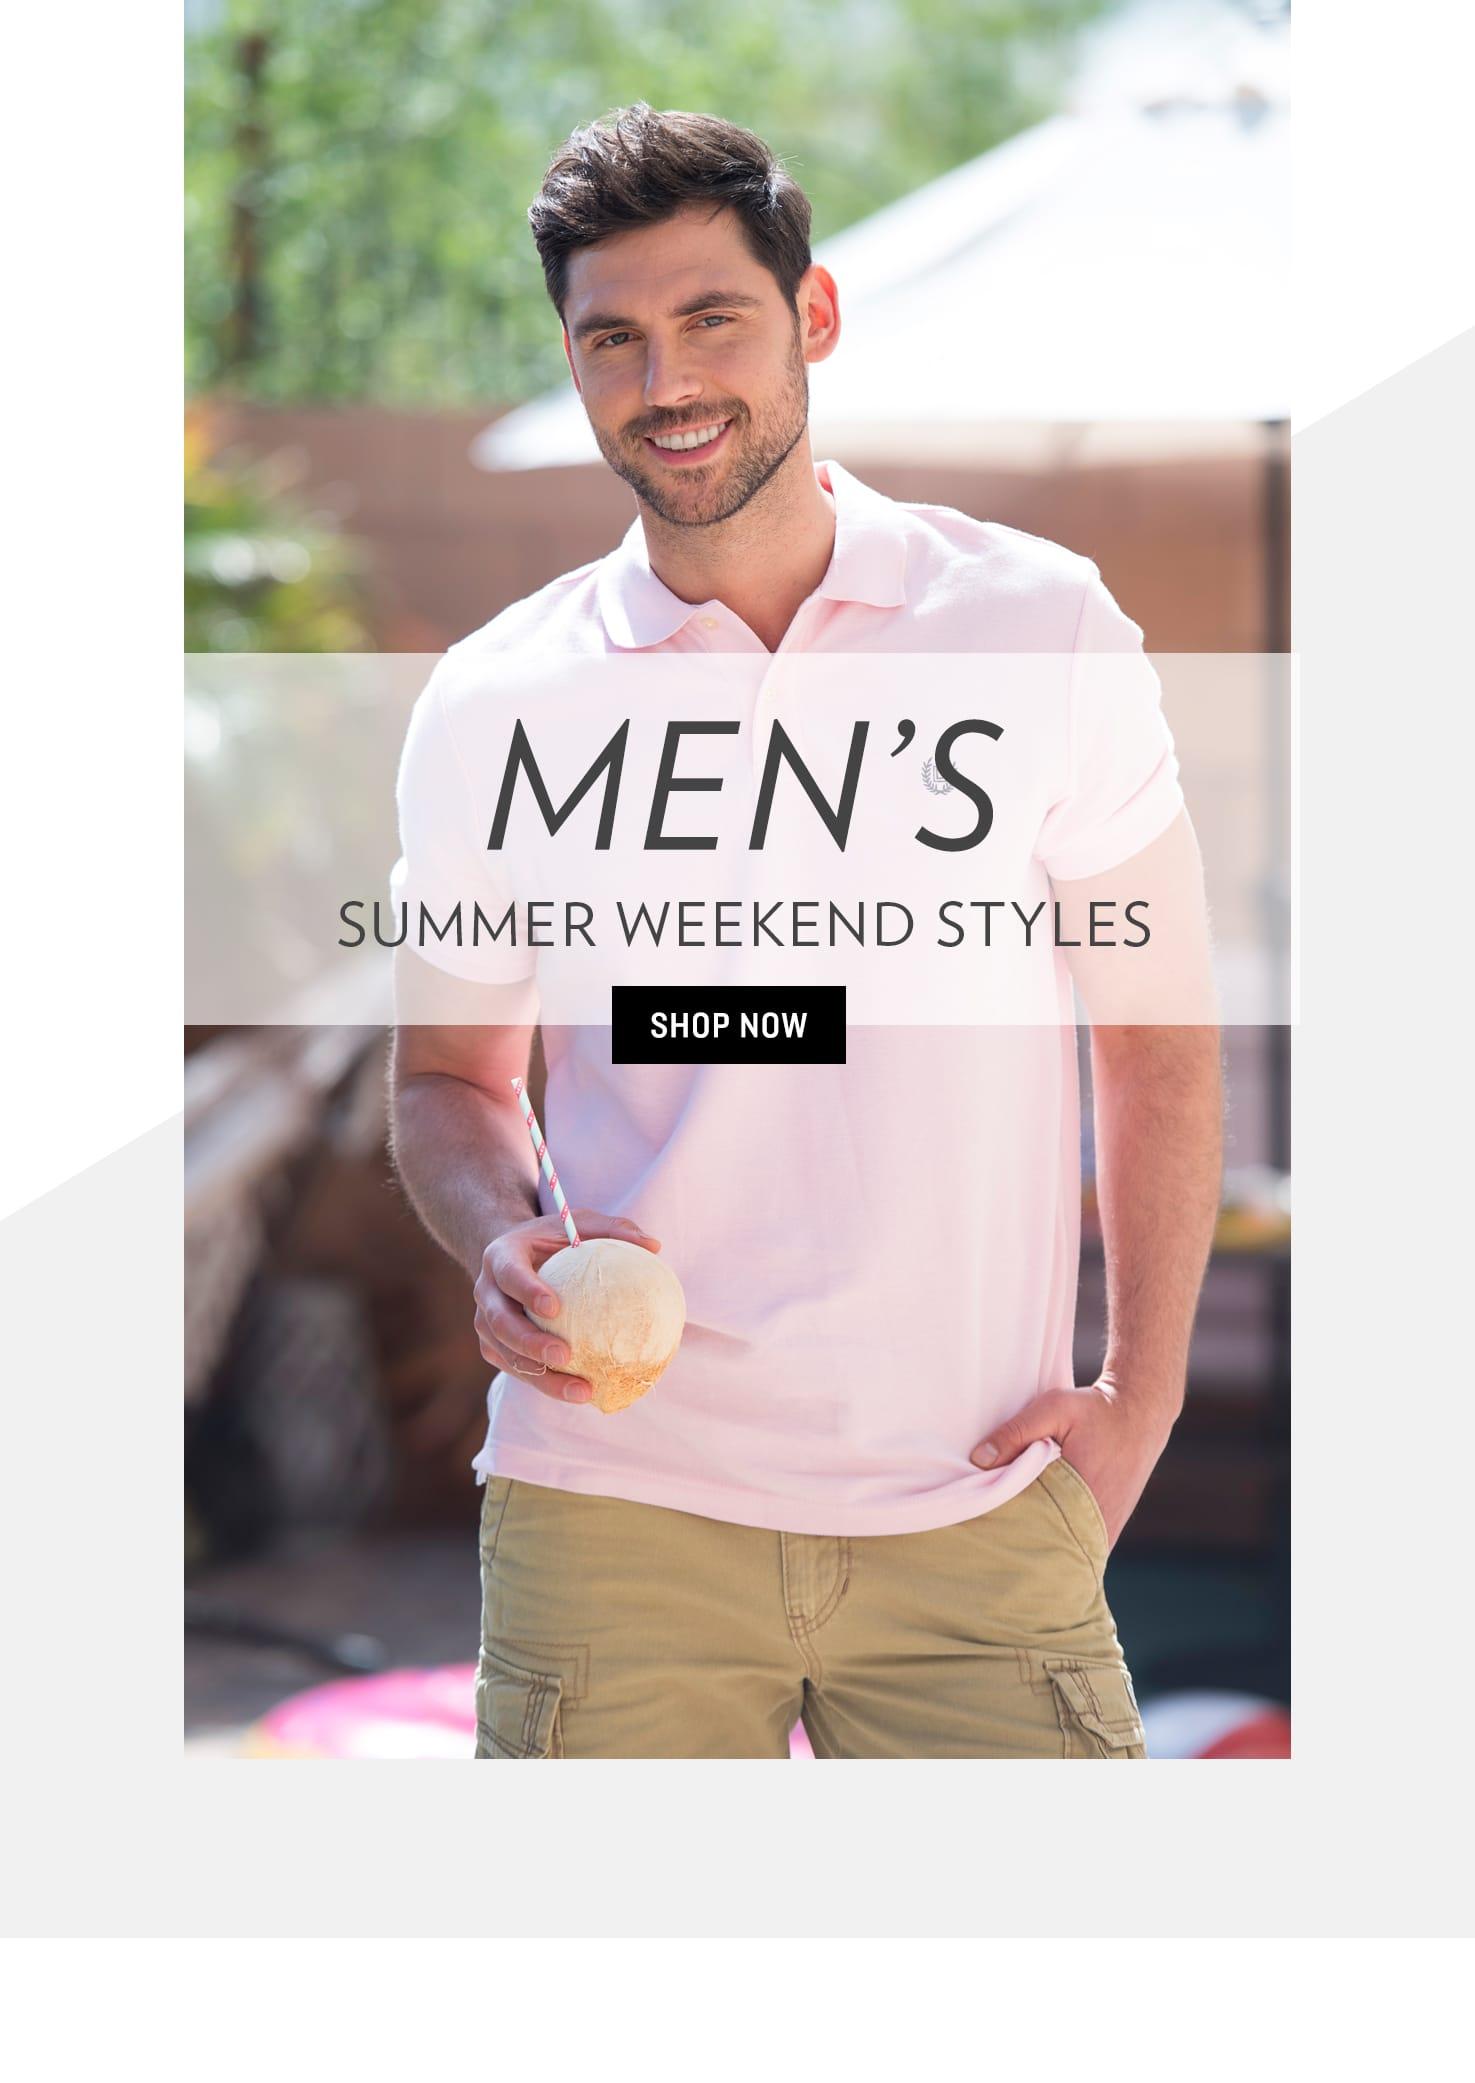 Shop Men's Summer Weekend